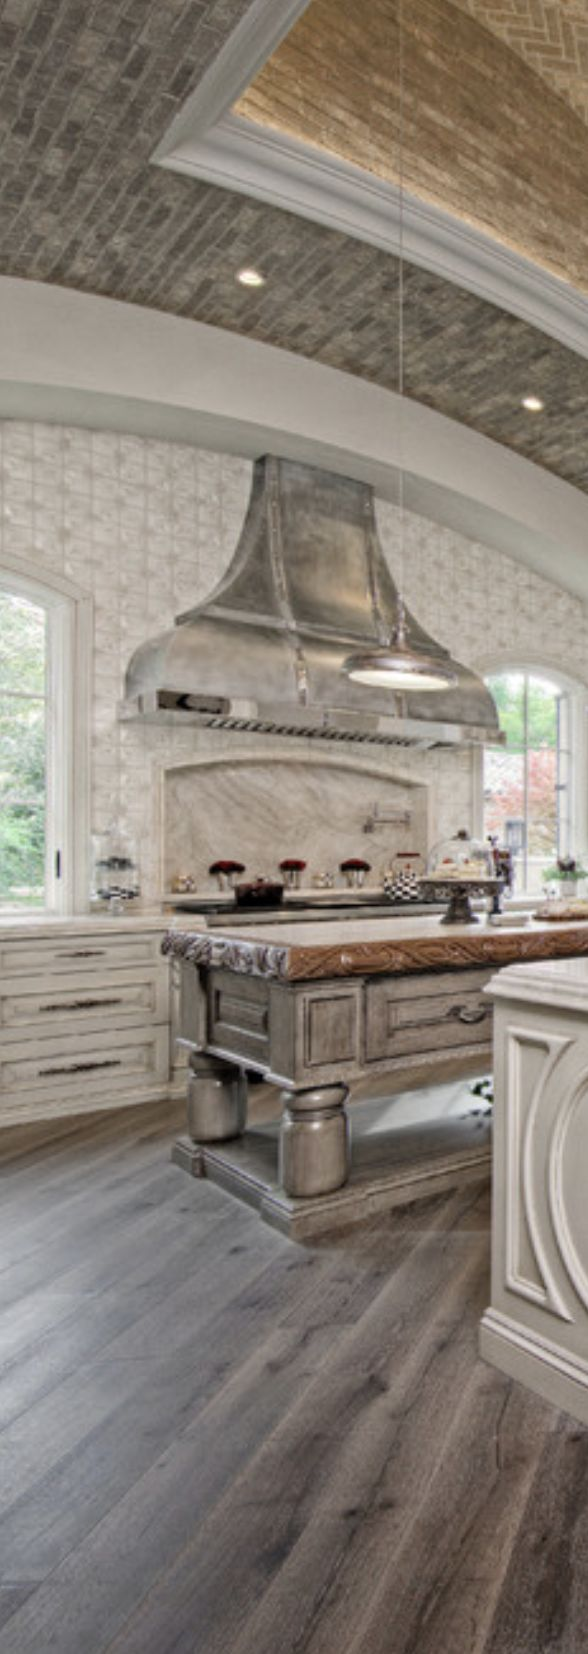 old world kitchen fabulous tile backsplash and hood